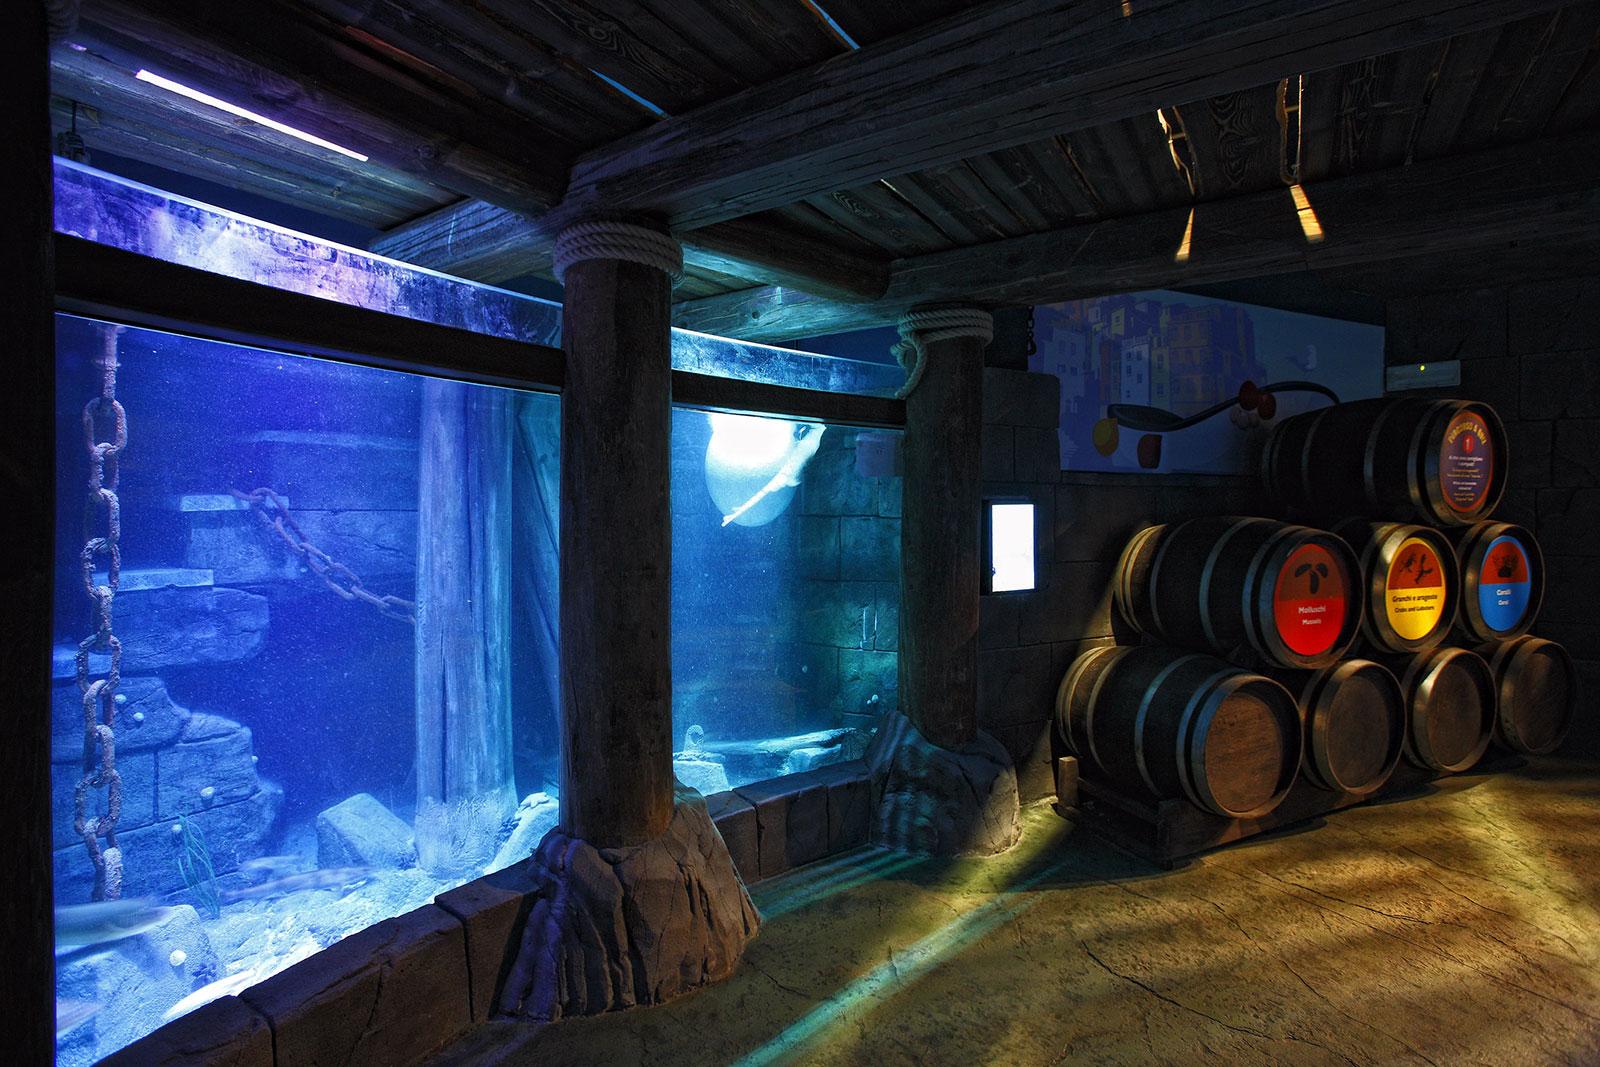 7--Sealife-Aquarium-Lido-di-Jesolo